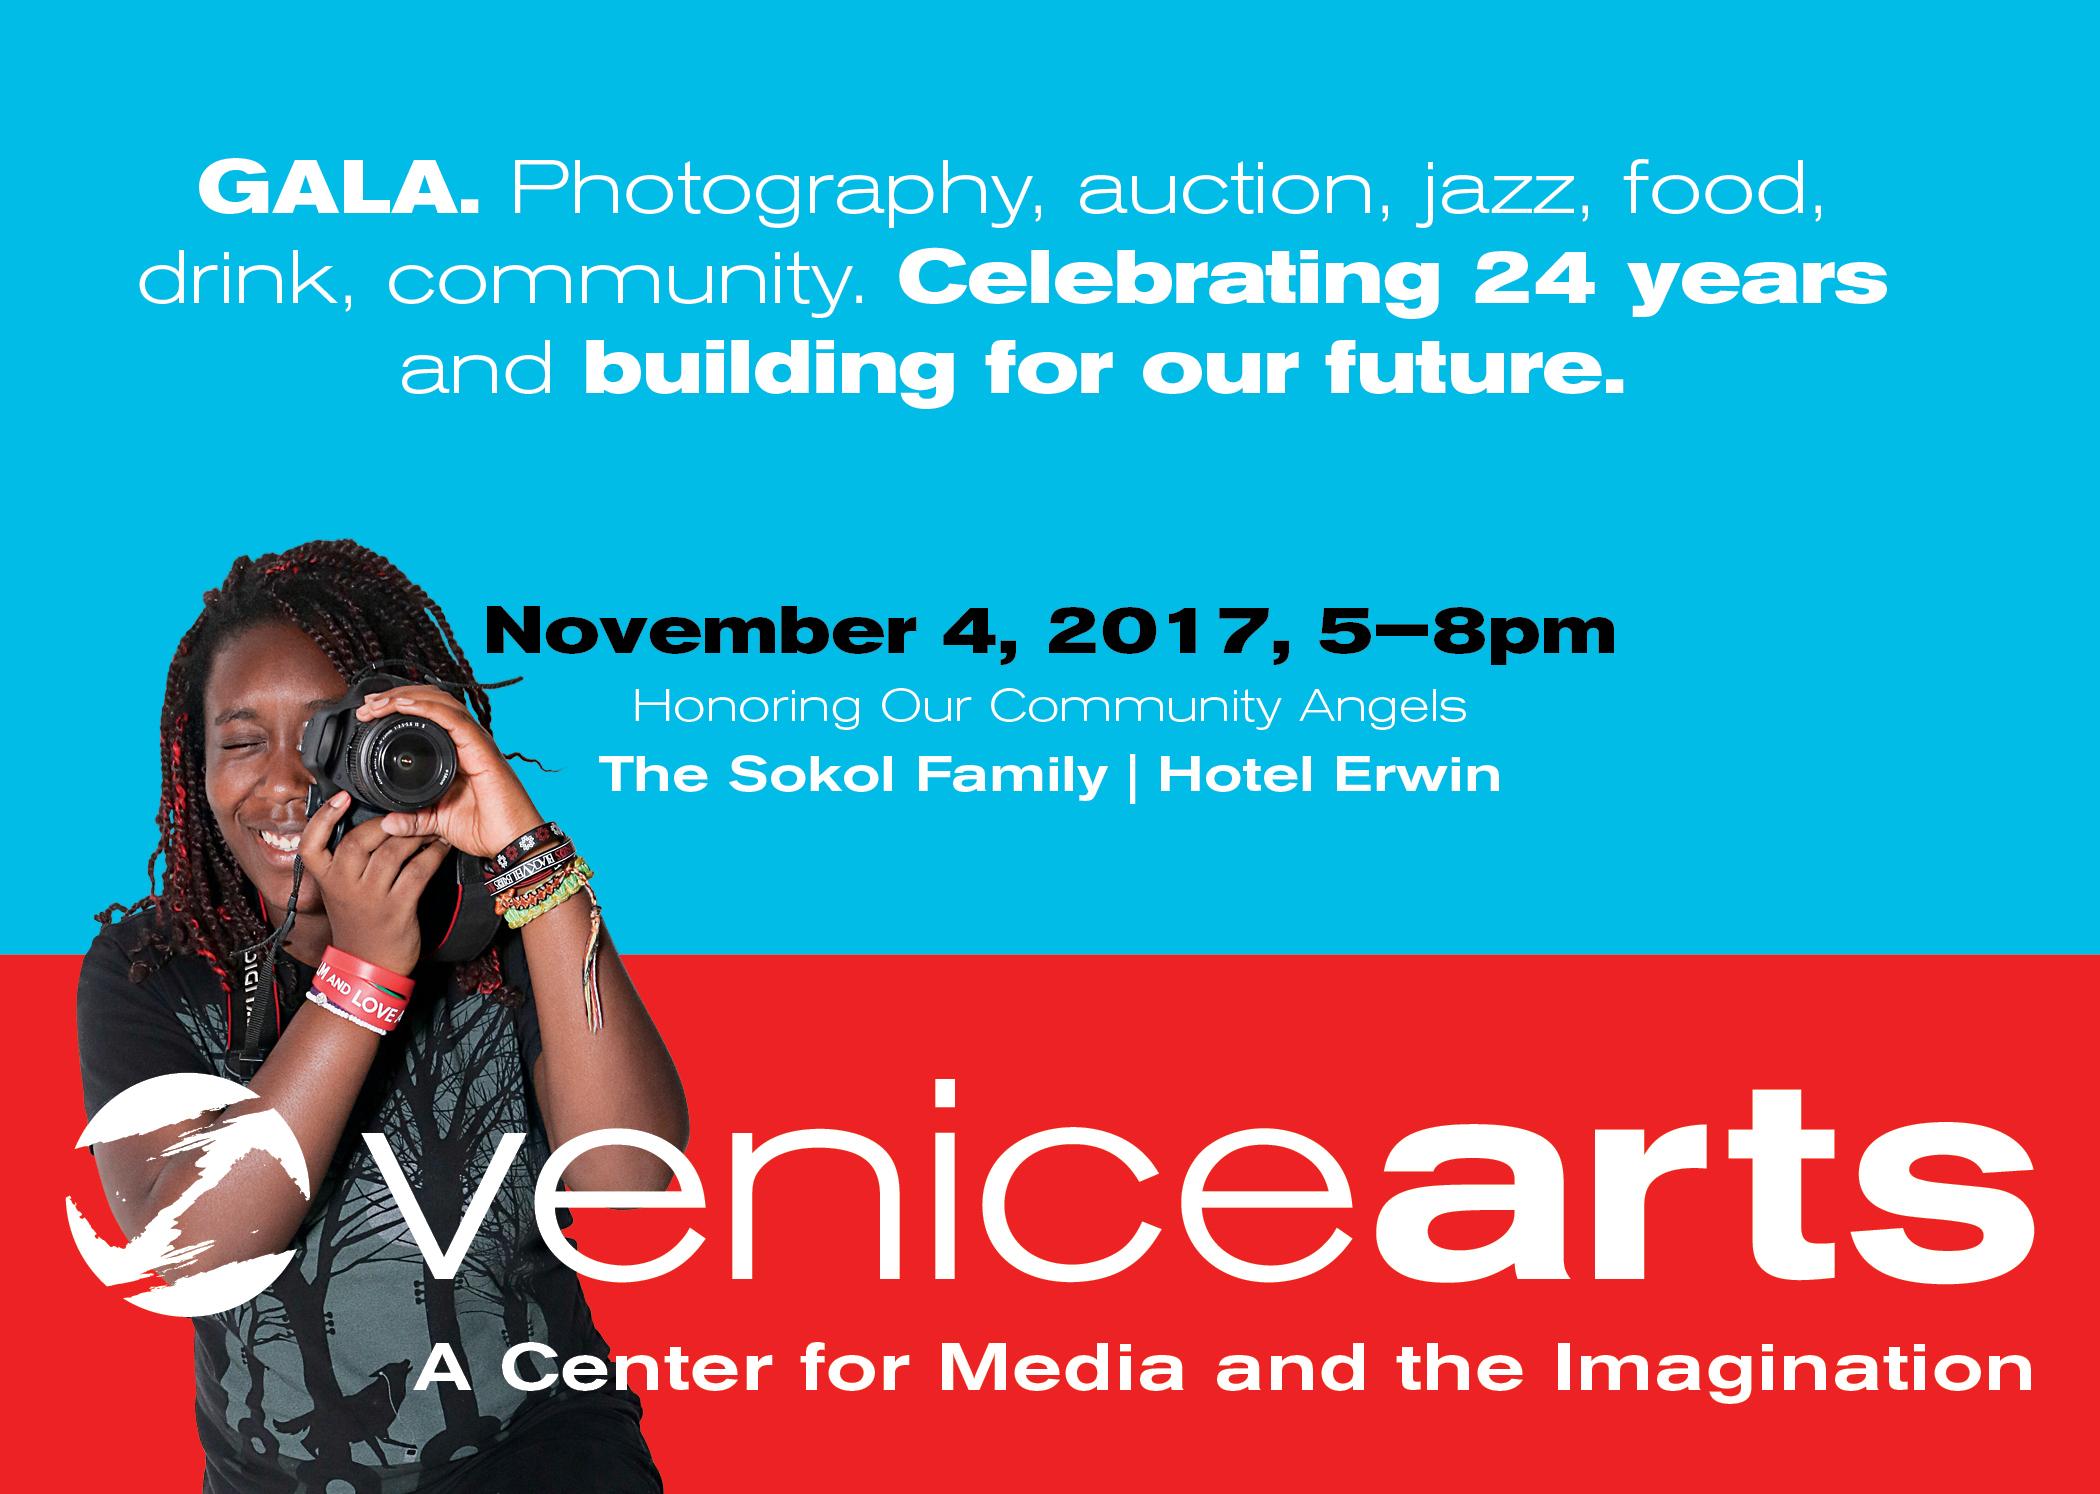 VeniceArts_GalaInvite.jpg